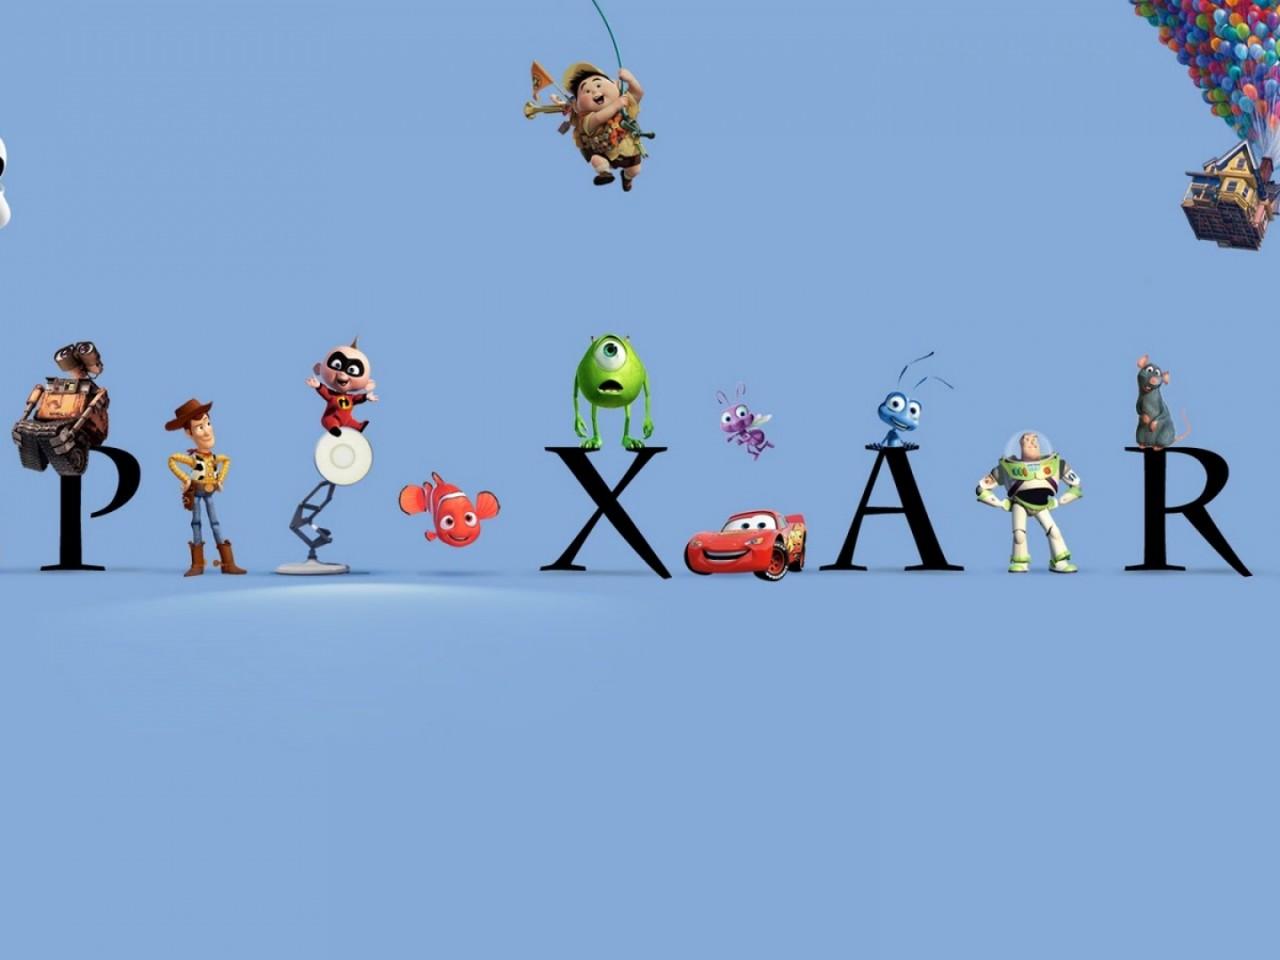 Ppt Wallpapers Animations Pixar Logo Wallpaper Hd Wallpapers